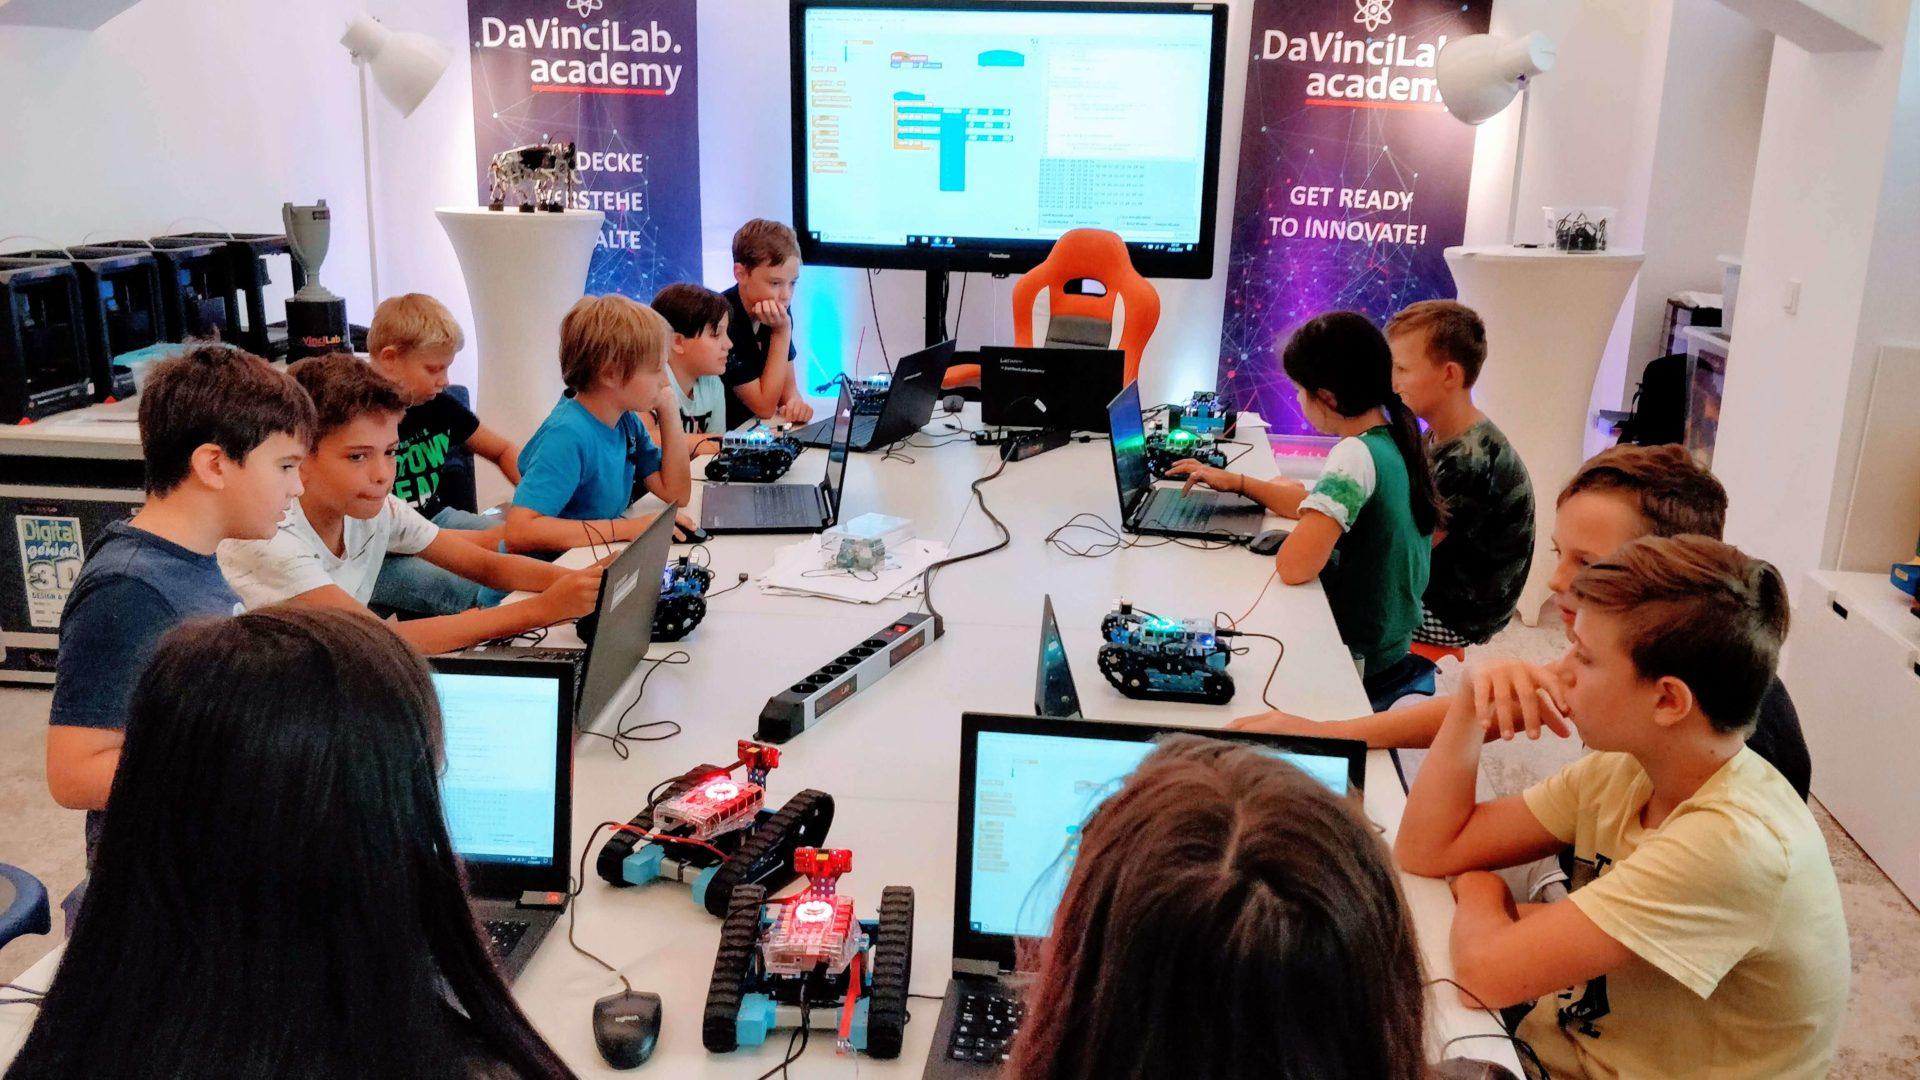 DaVinciLab Sommercamp